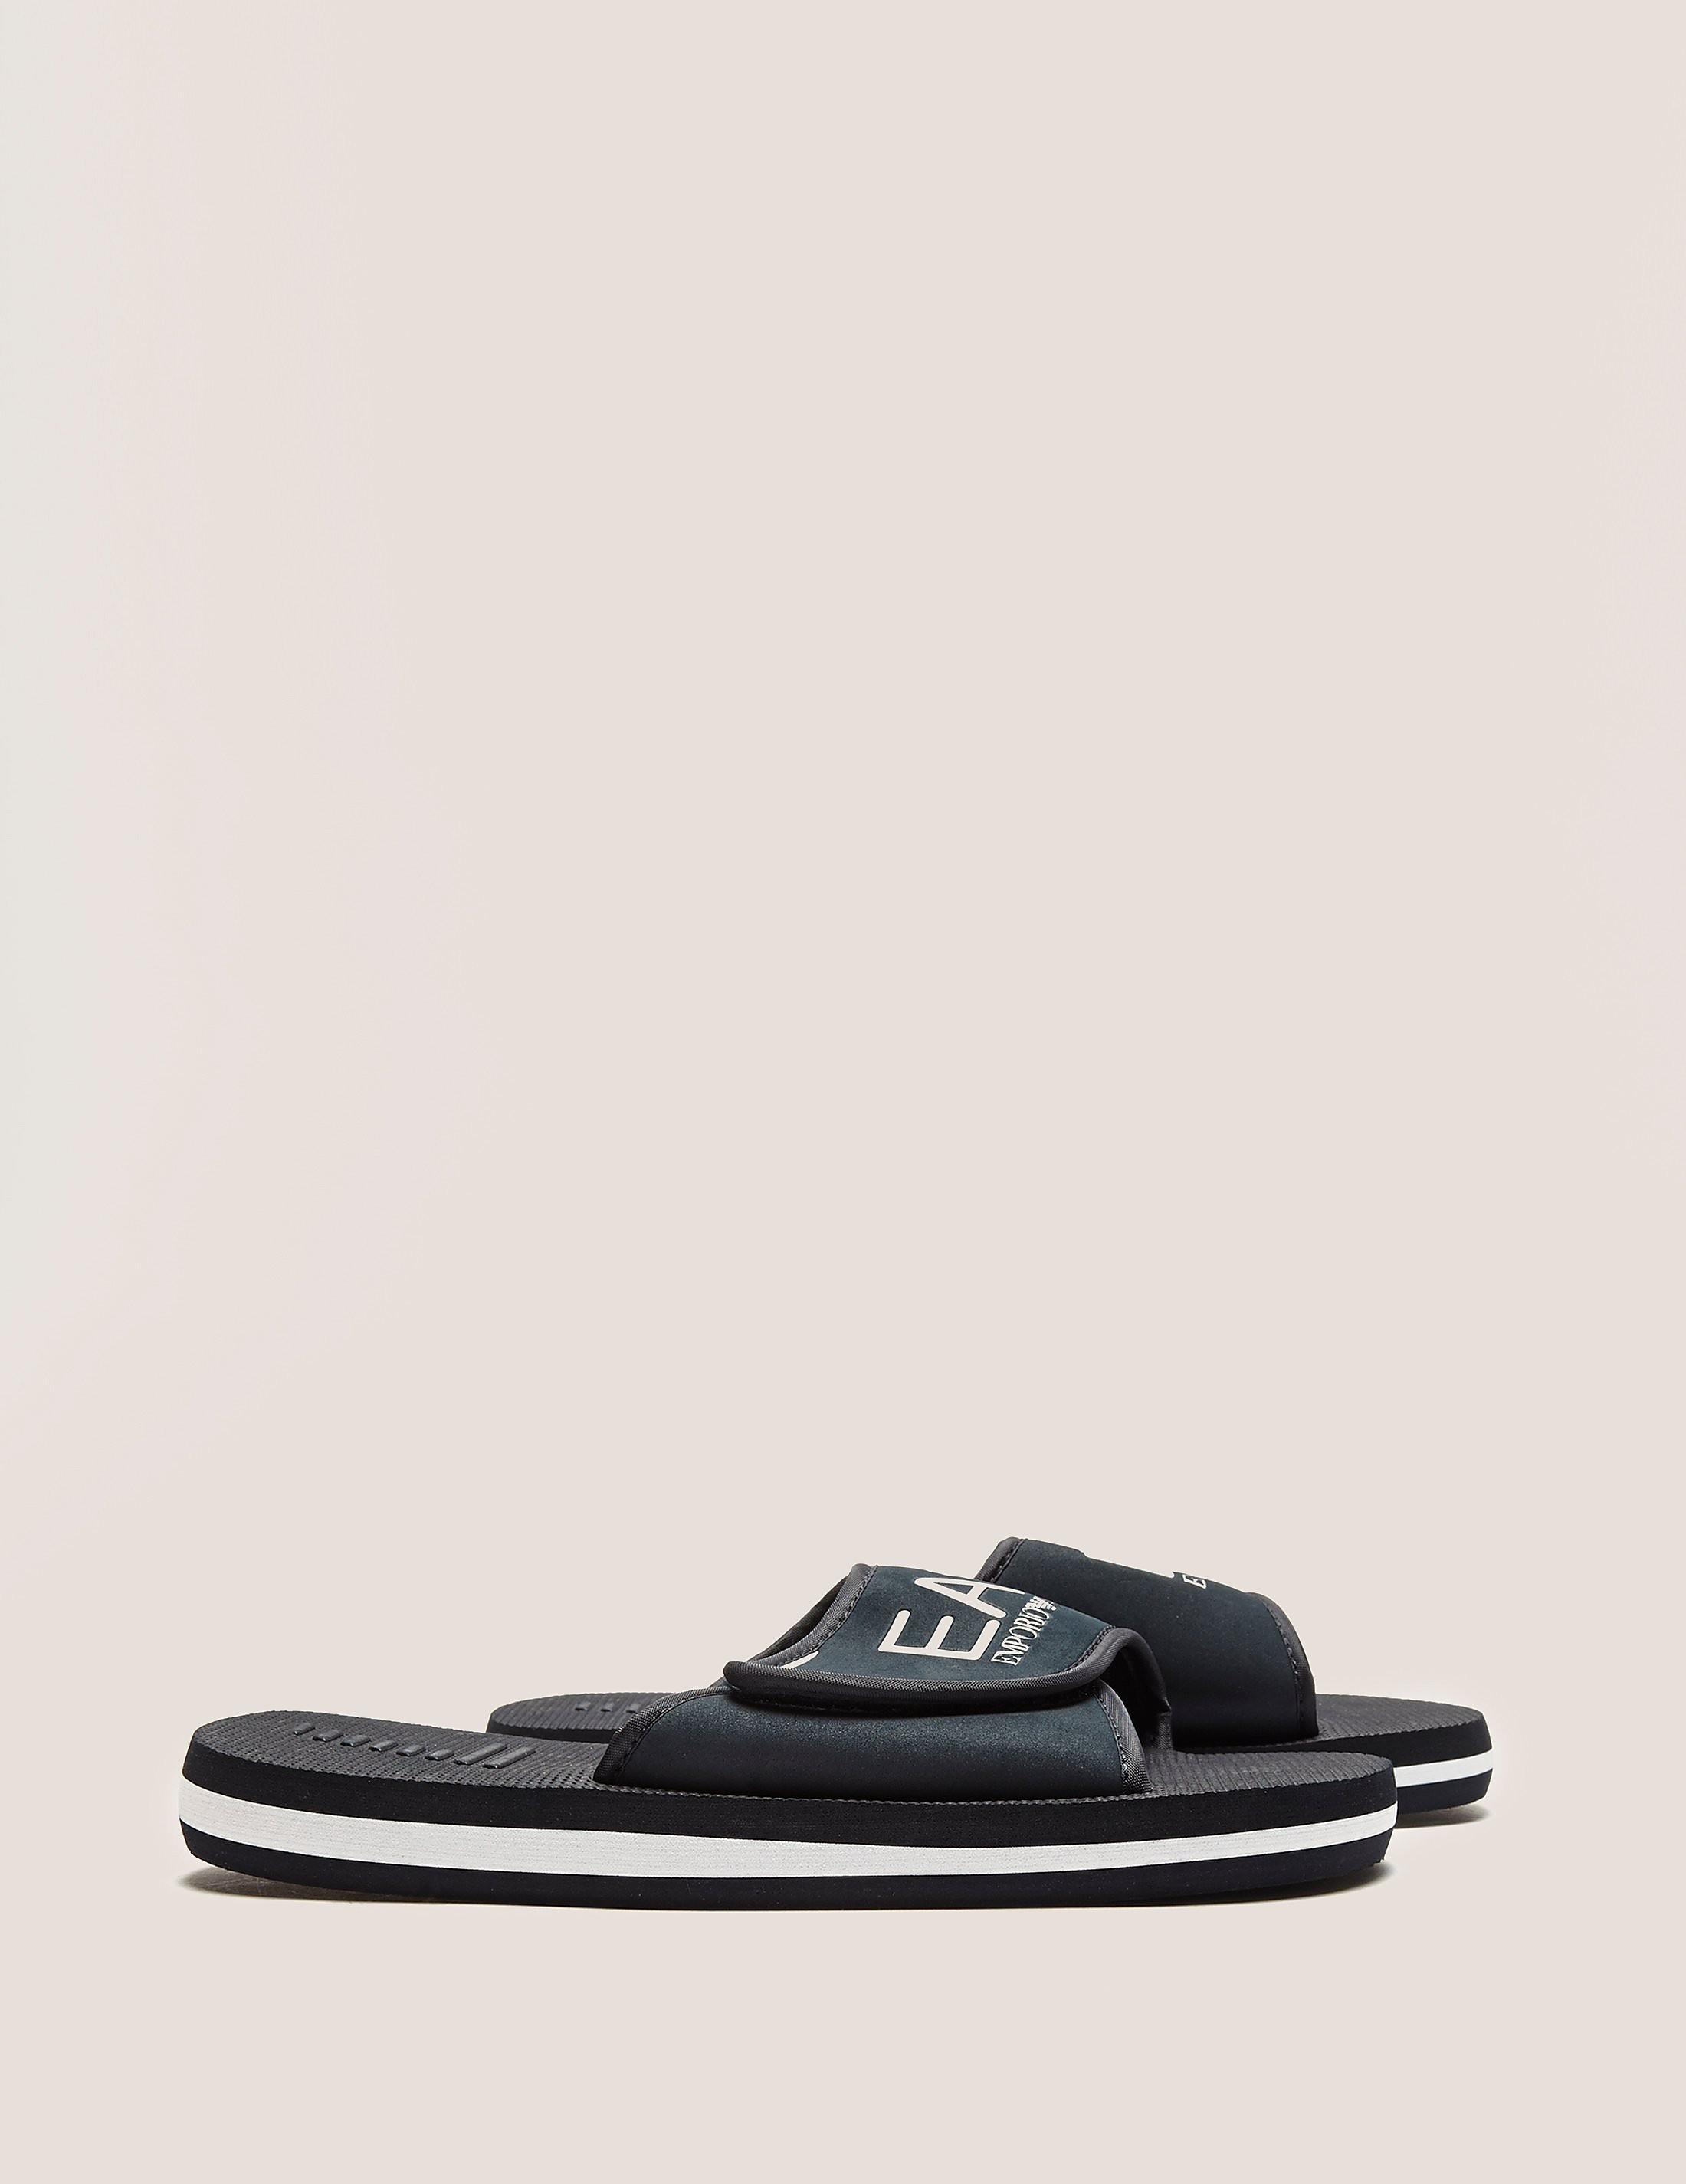 Emporio Armani EA7 Swim Slip-On Sandals